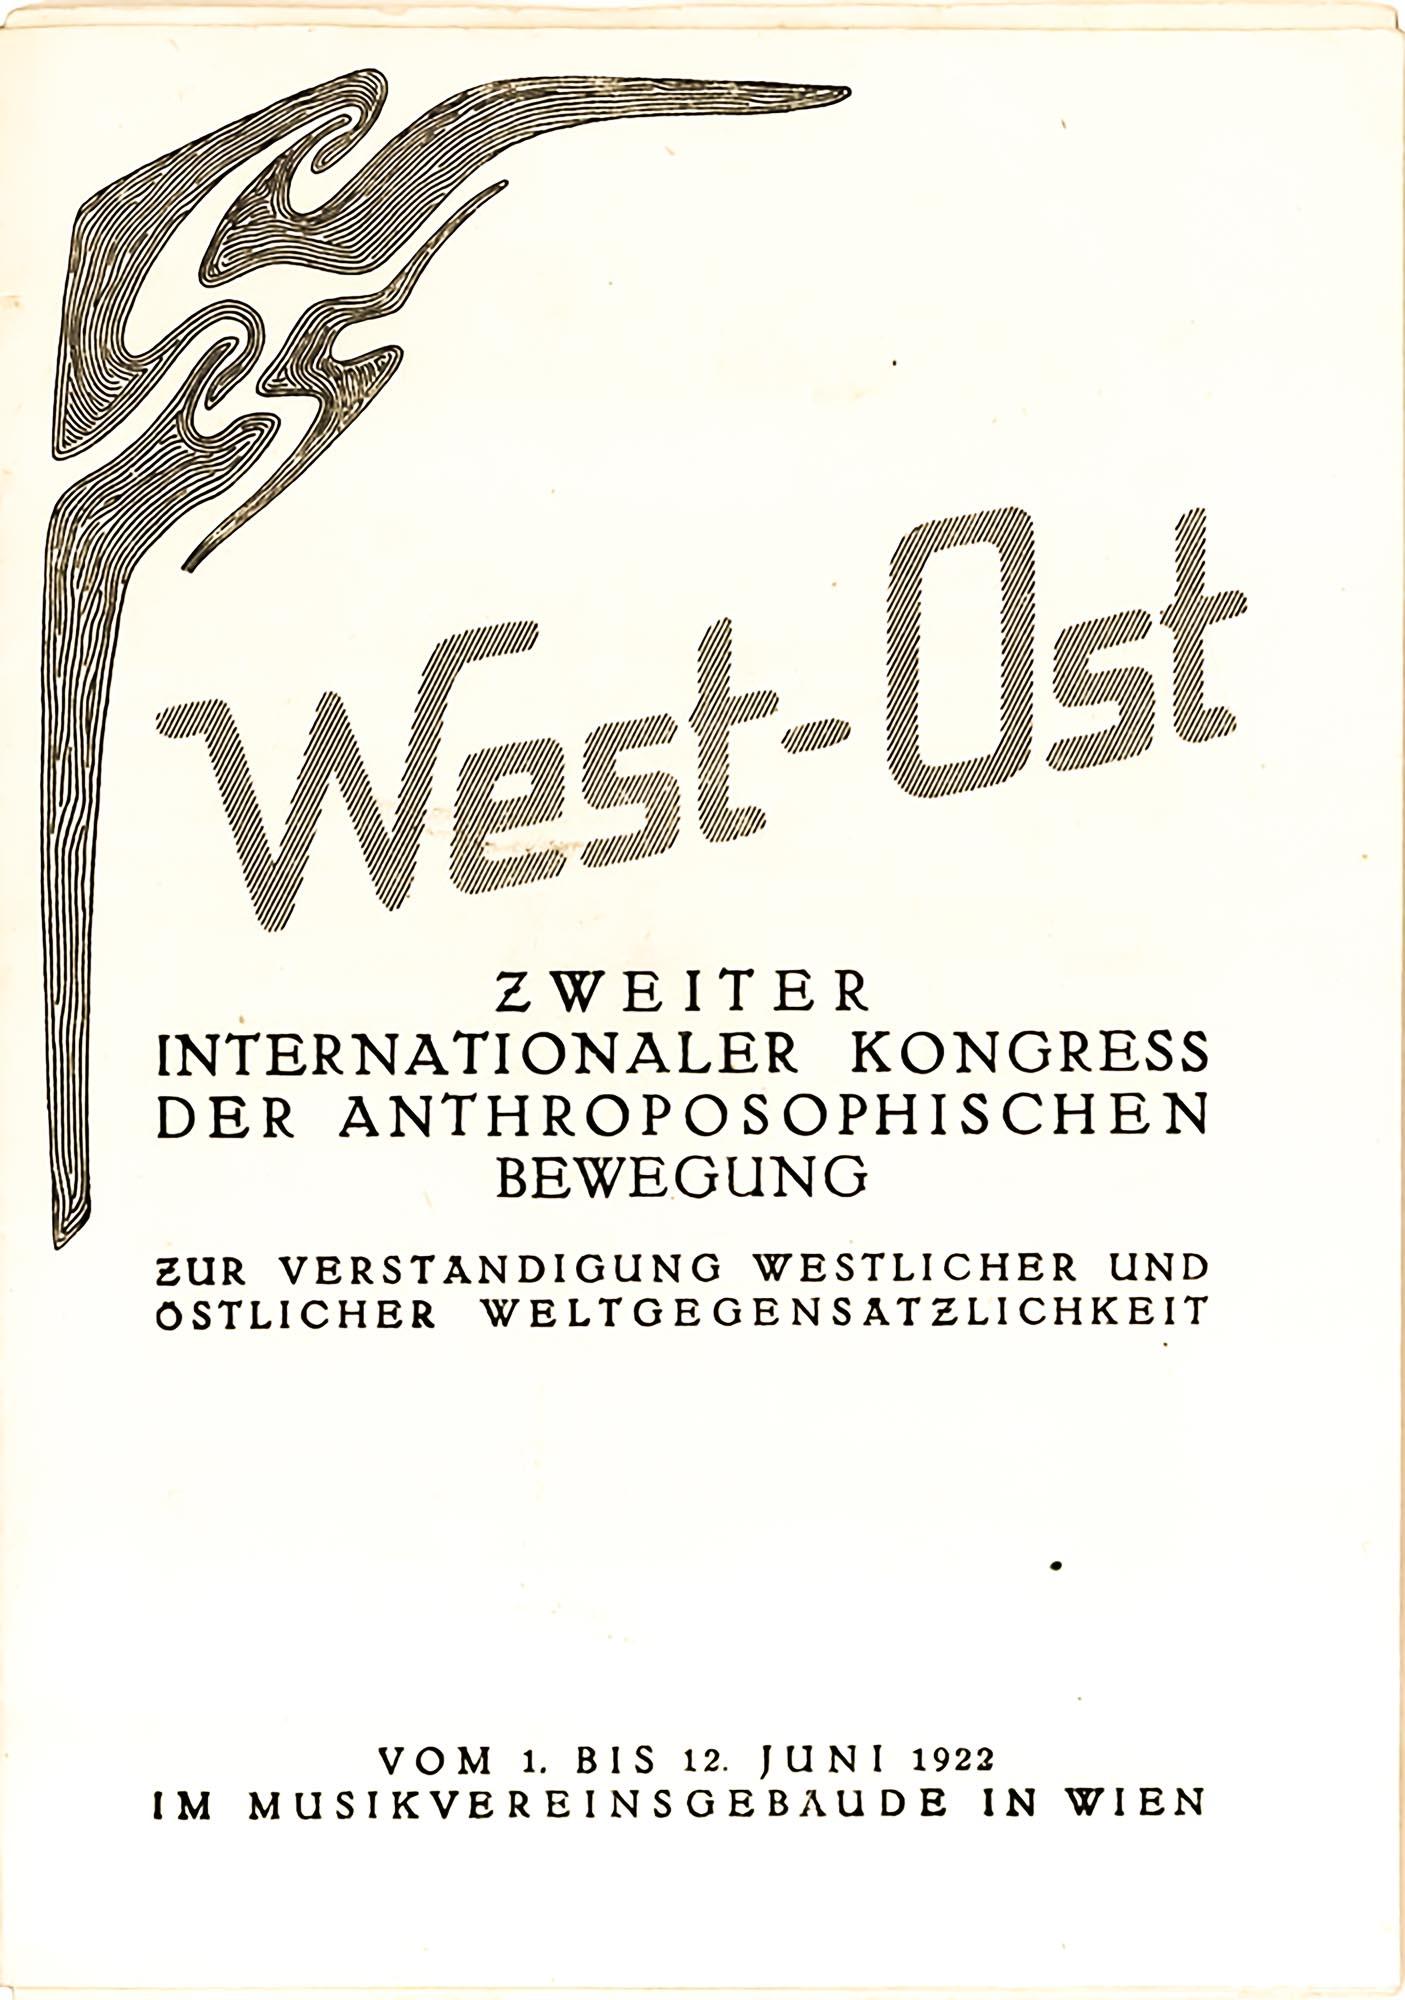 sp2_West-Ost_ph-3000 x 4269-LR-Jonas.jpg